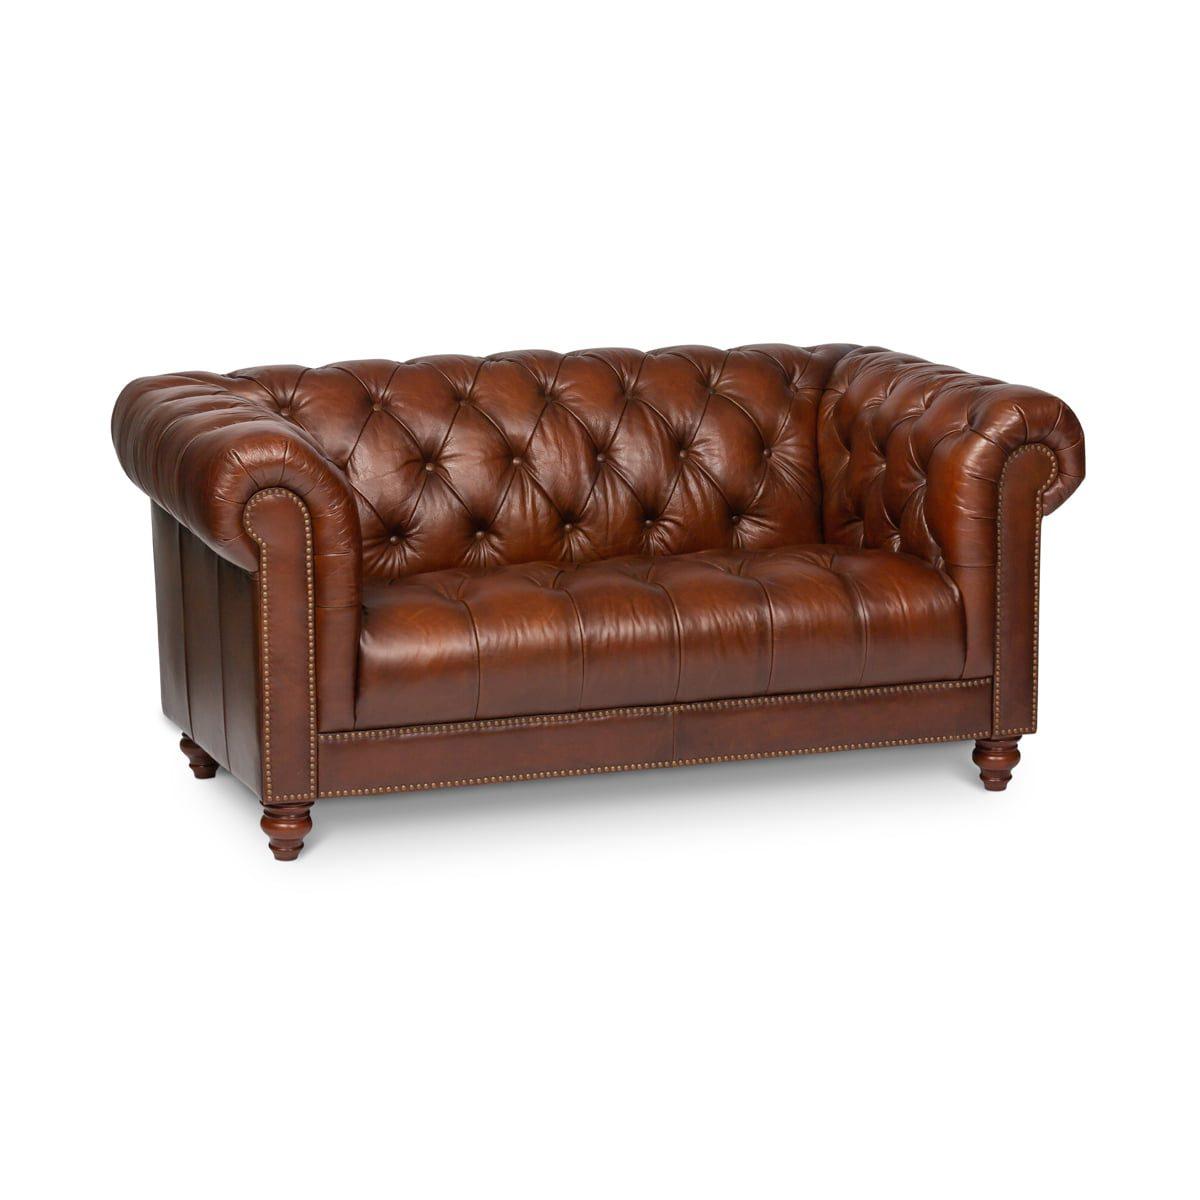 Bologna Vintage Tan 2 Seater Sofa